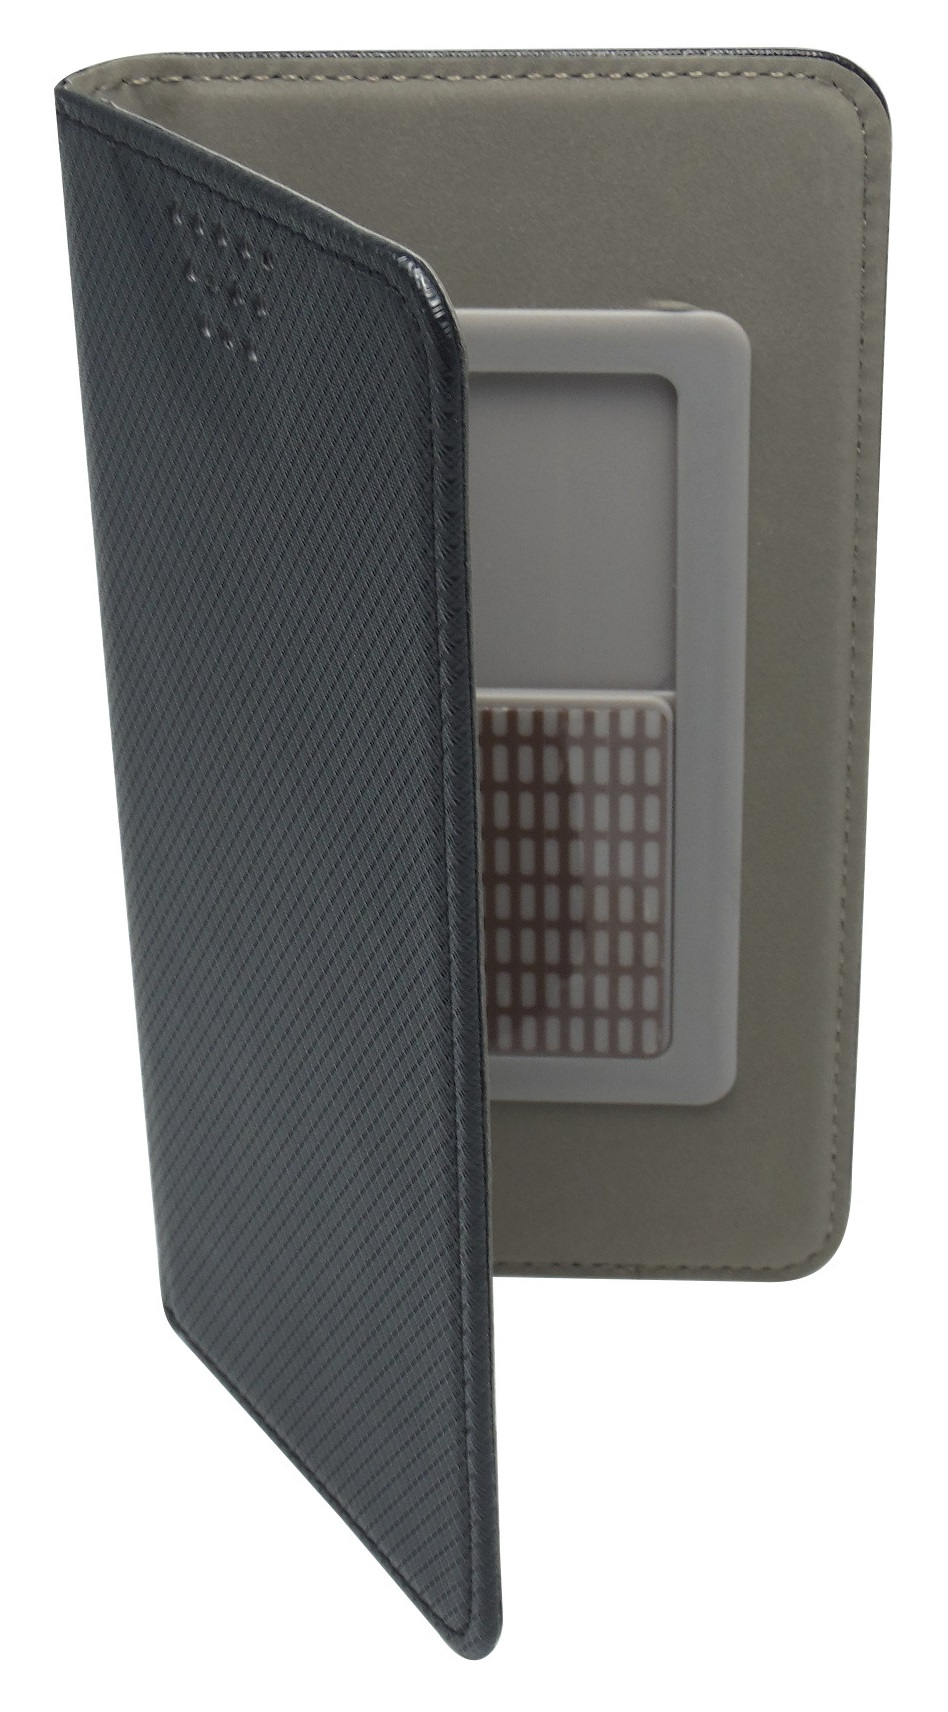 Husa universala GreenGo Smart Magnet neagra pentru telefoane cu diagonala de 5,5 - 5,7 inch